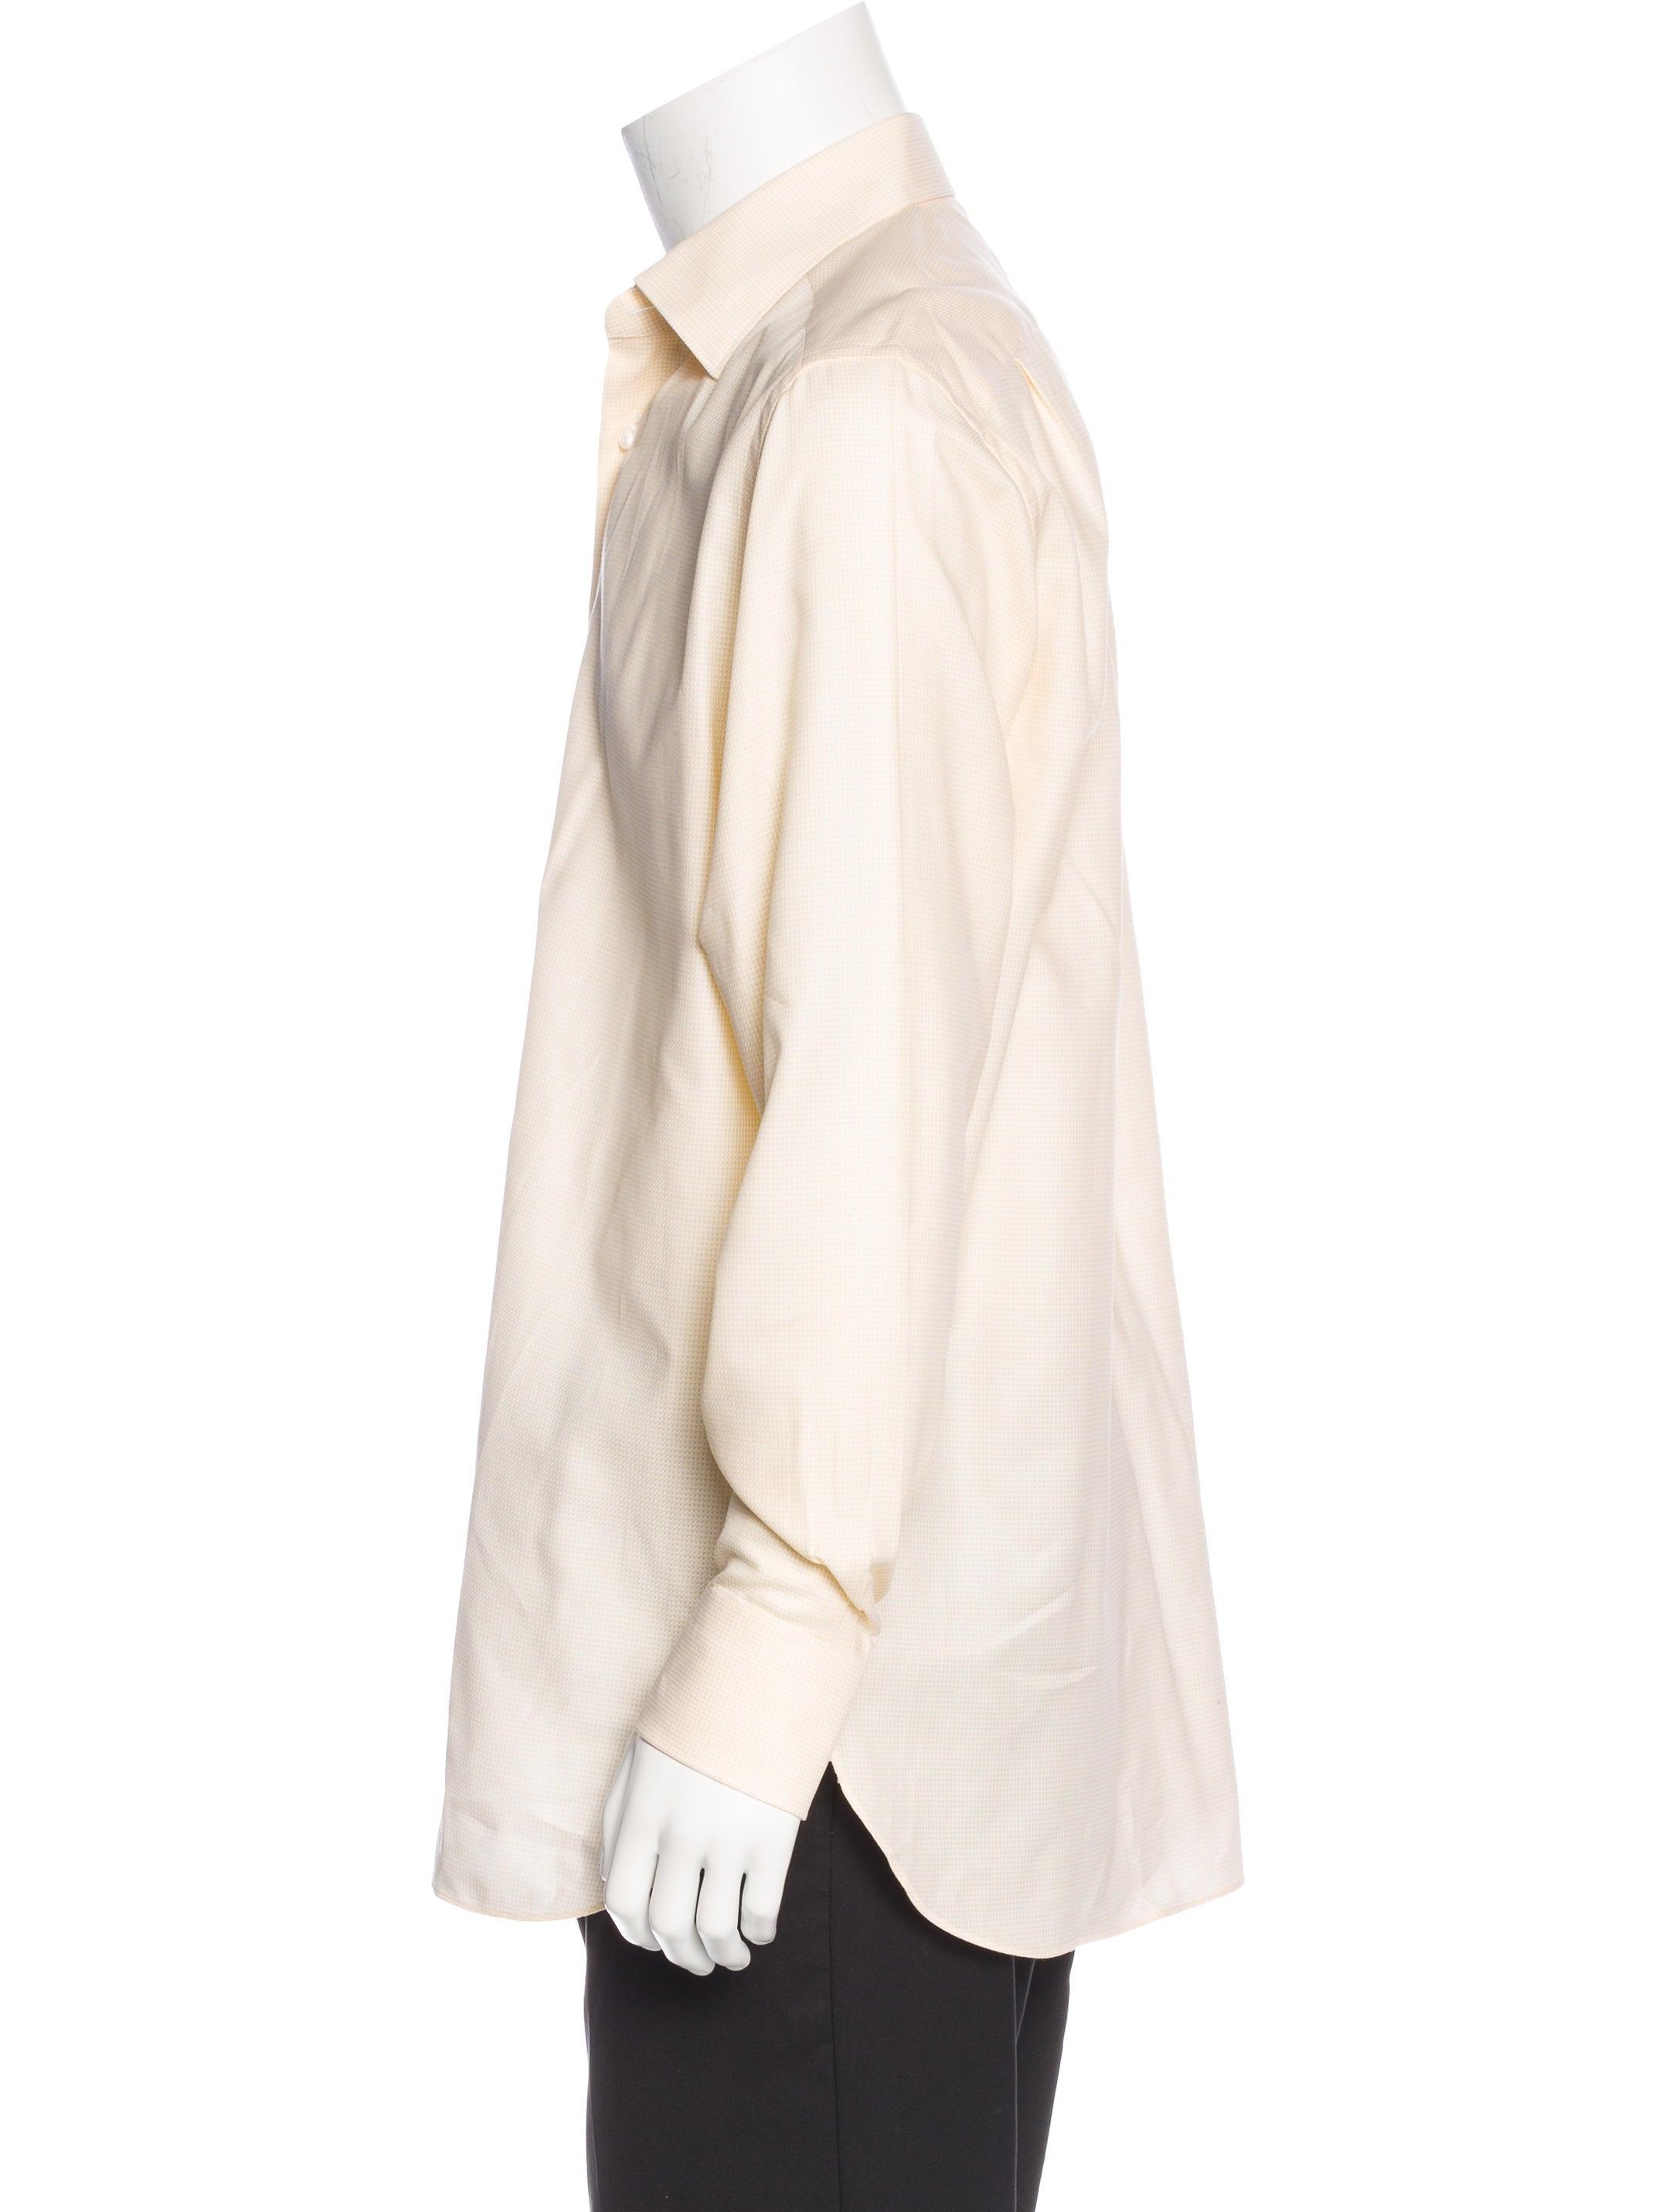 Ermenegildo zegna regular fit print shirt clothing for Regular fit dress shirt